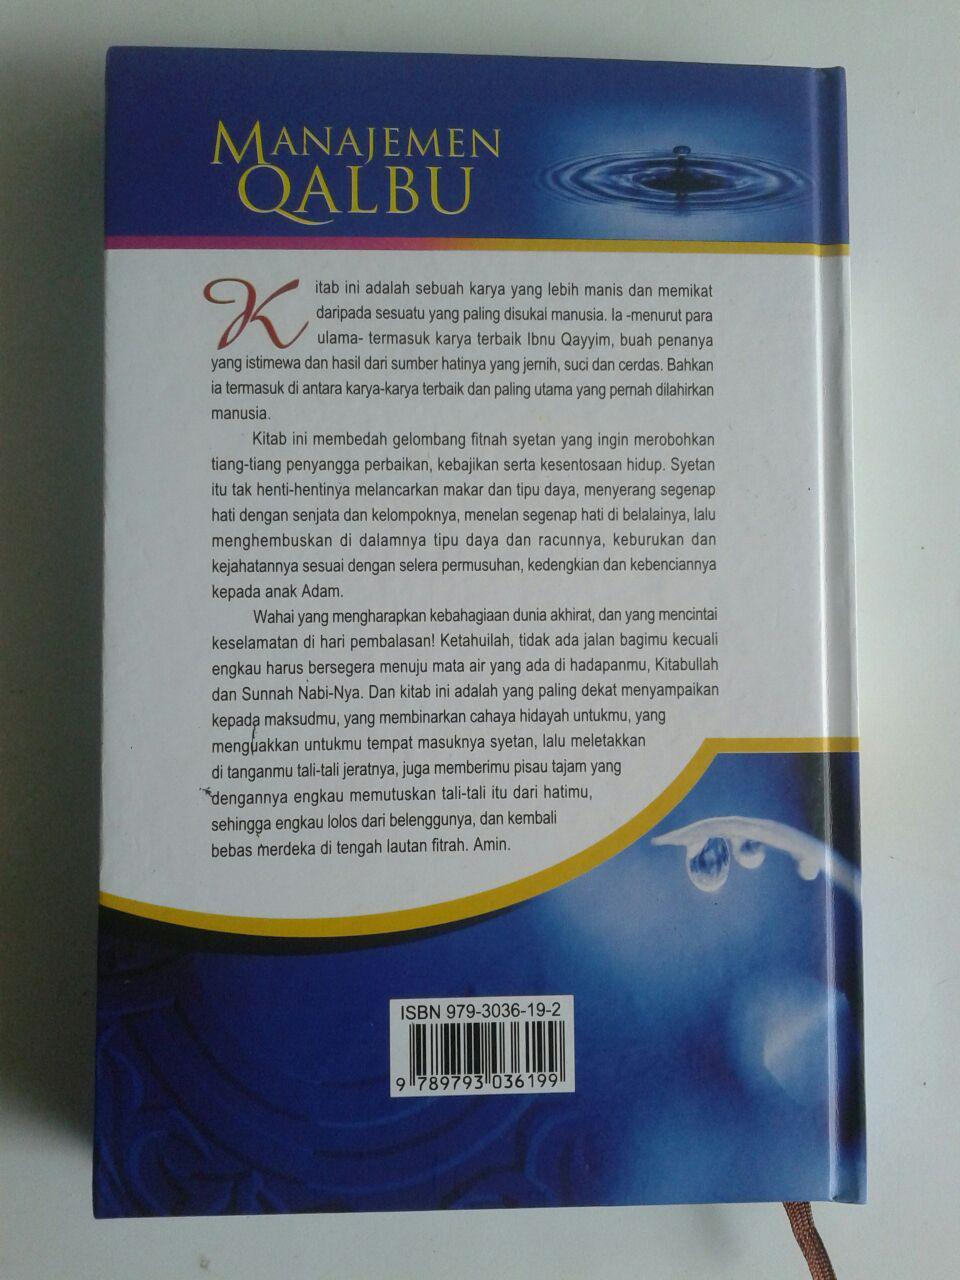 Buku Manajemen Qalbu cover